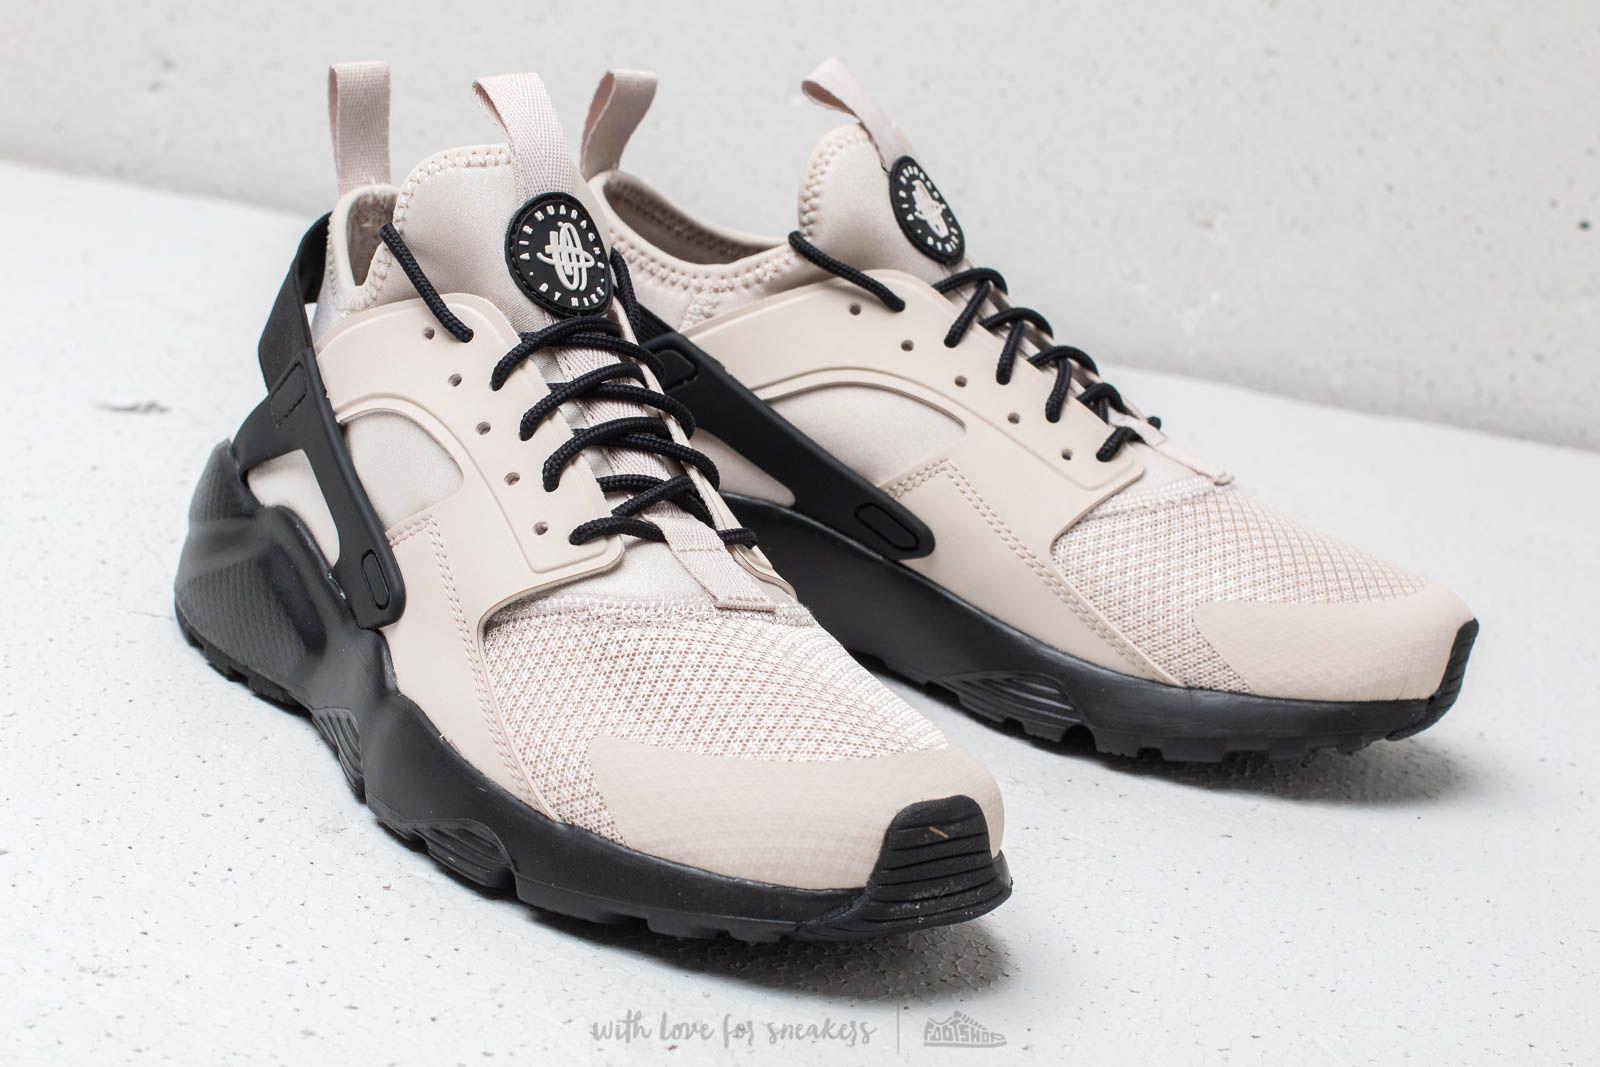 de9de567c3b5 Lyst - Nike Air Huarache Run Ultra Desert Sand  Black-dark Grey for Men